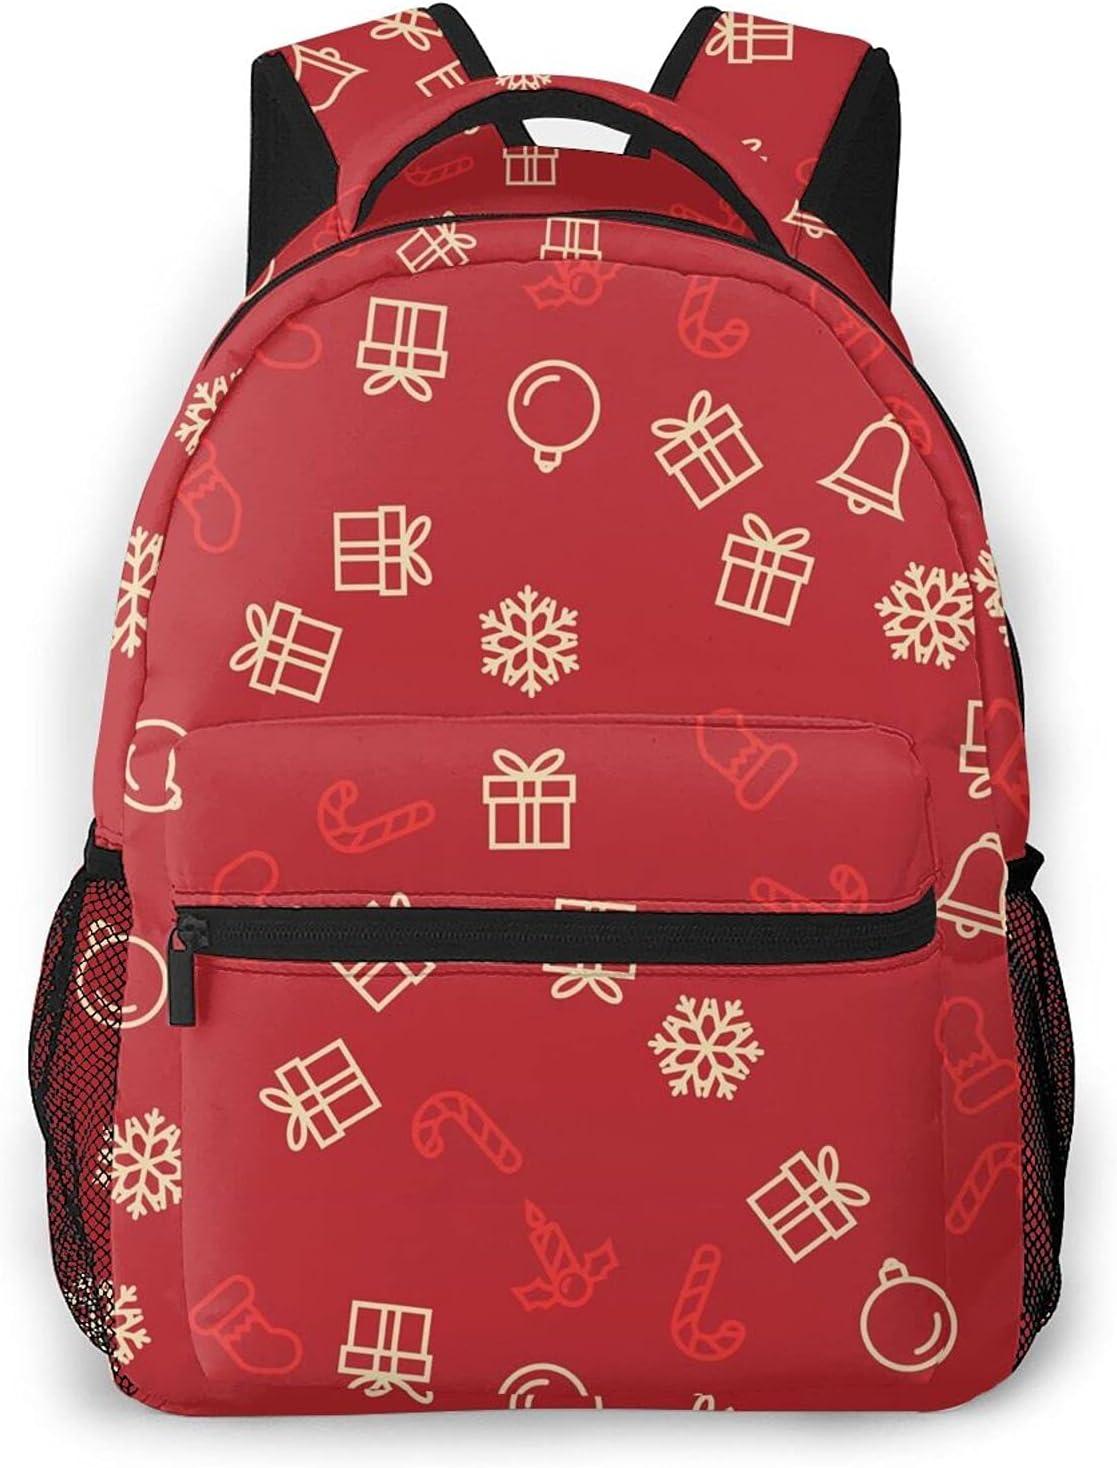 Backpack Unisex School Bag Christmas Seasonal Wrap Introduction Canvas Selling Gifts Rucksack Lapto